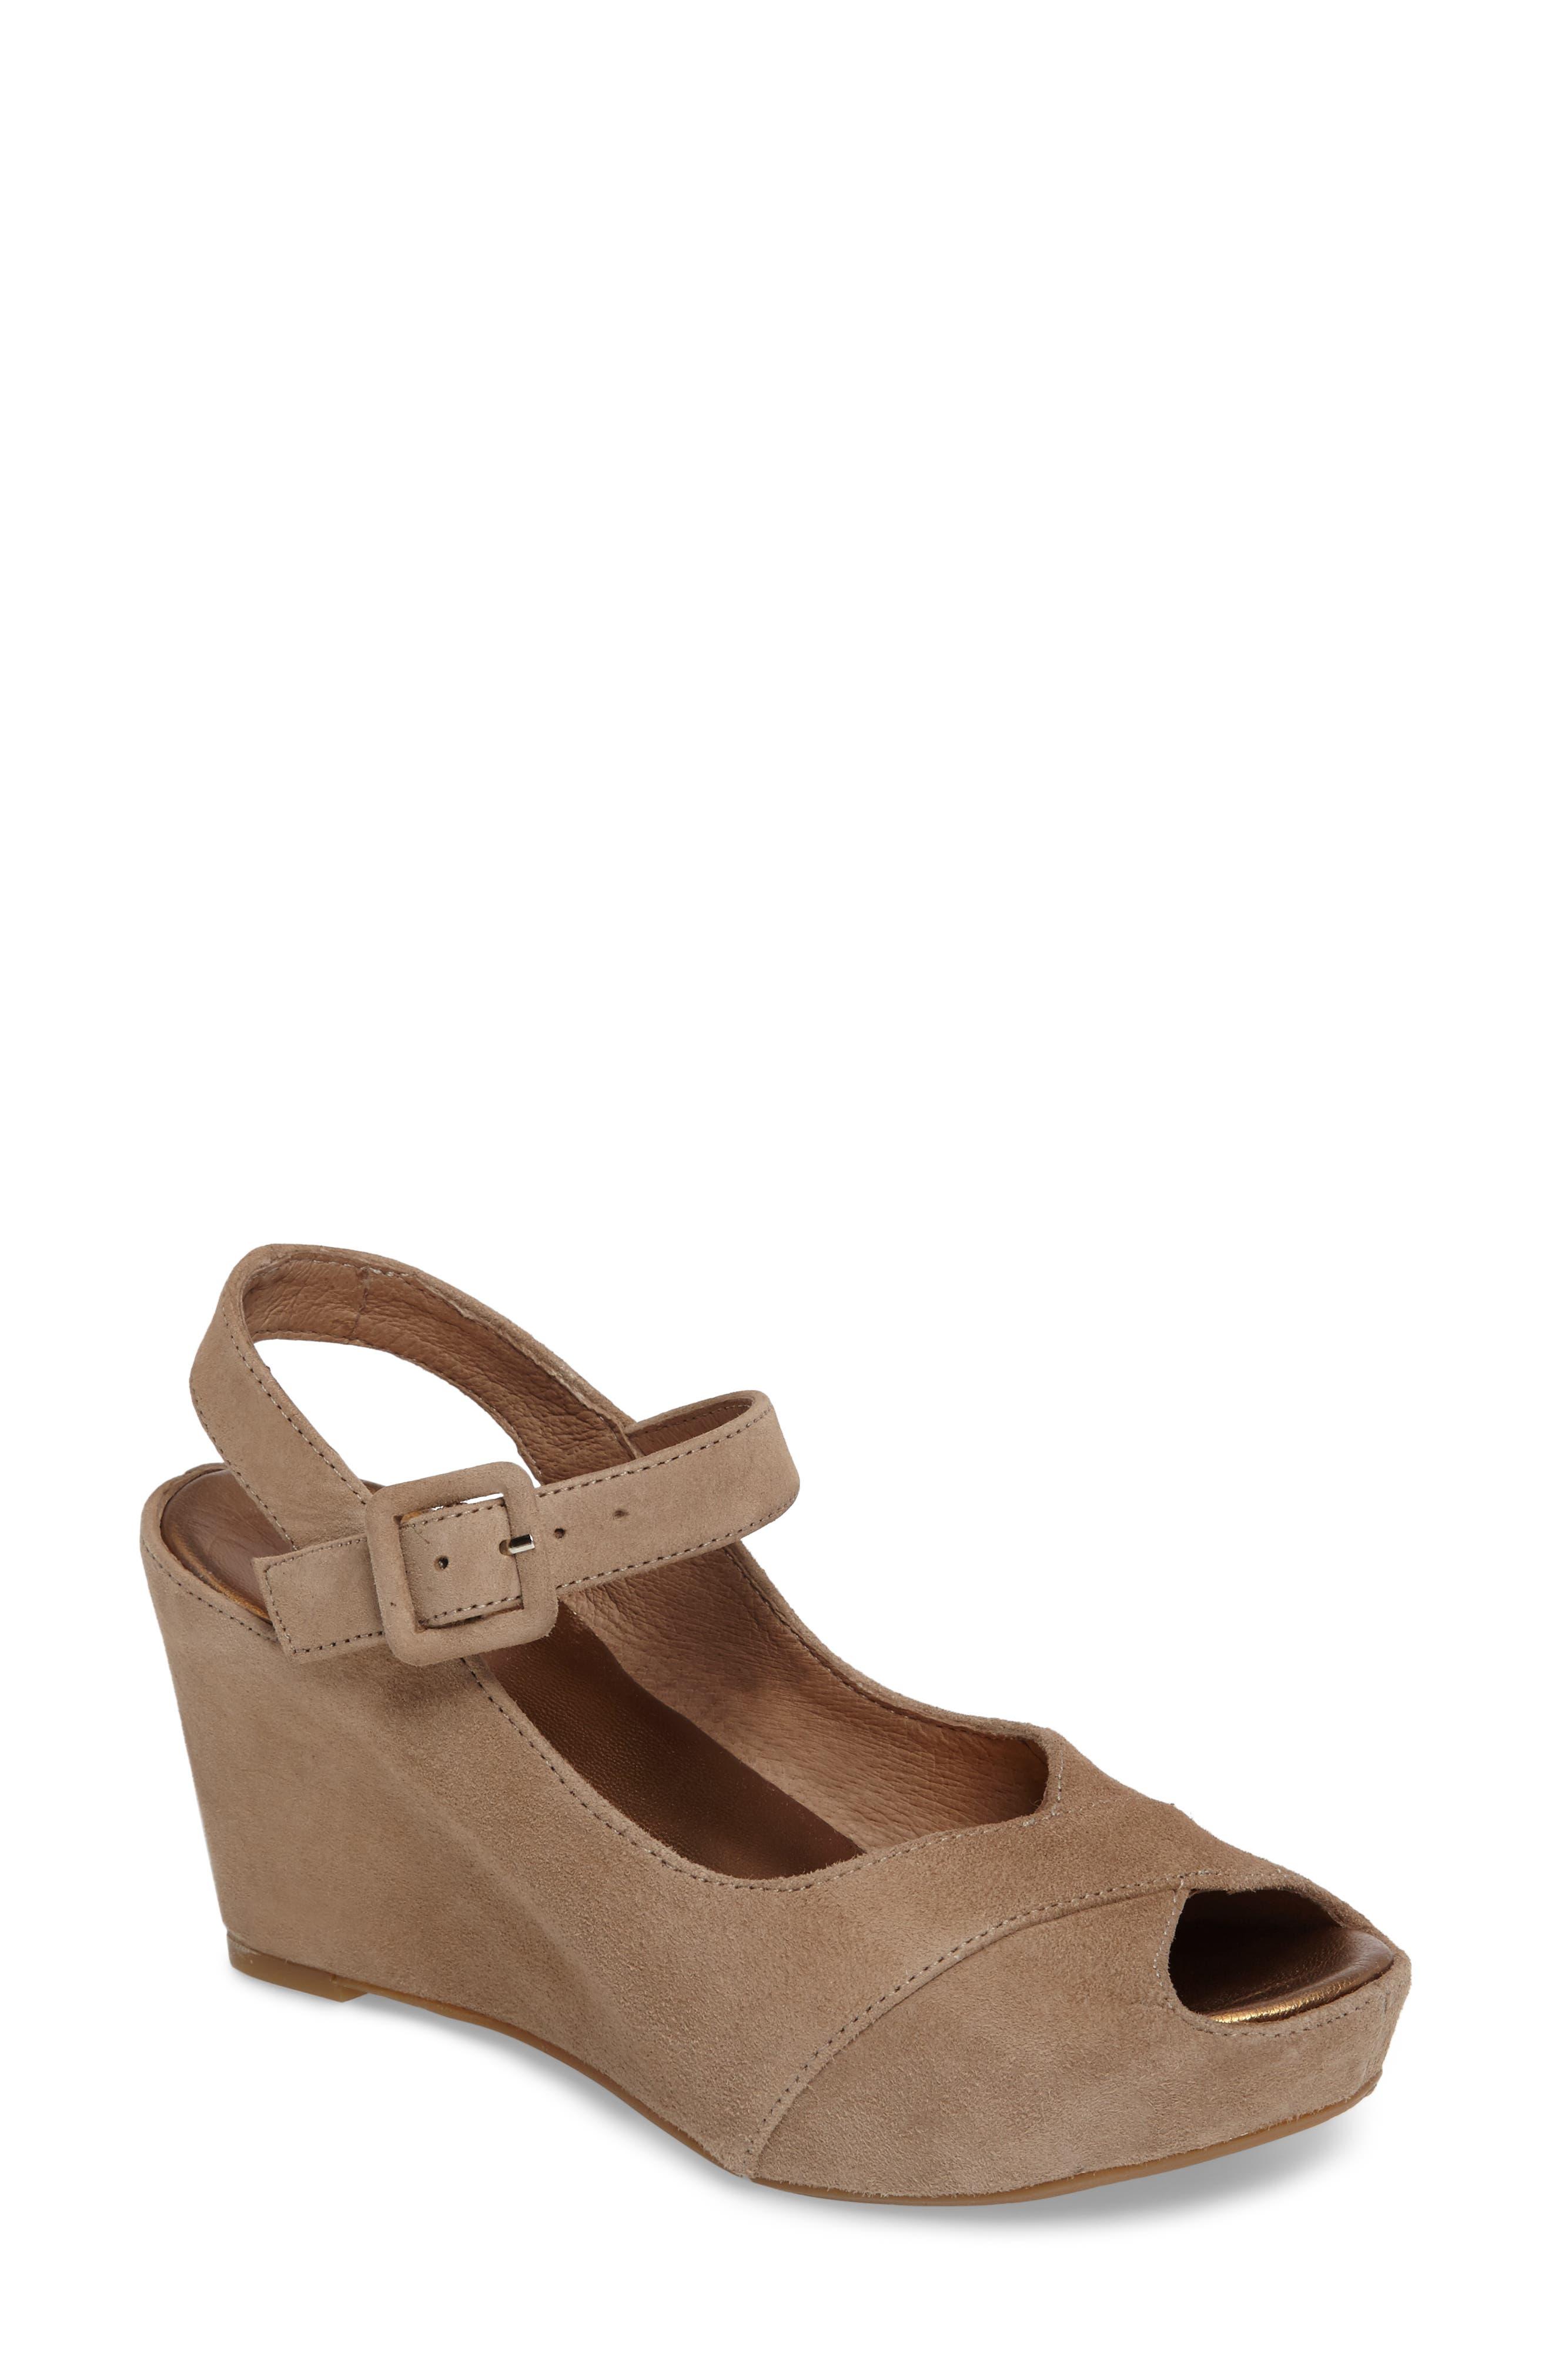 Tara Platform Wedge Sandal,                         Main,                         color, Taupe Suede